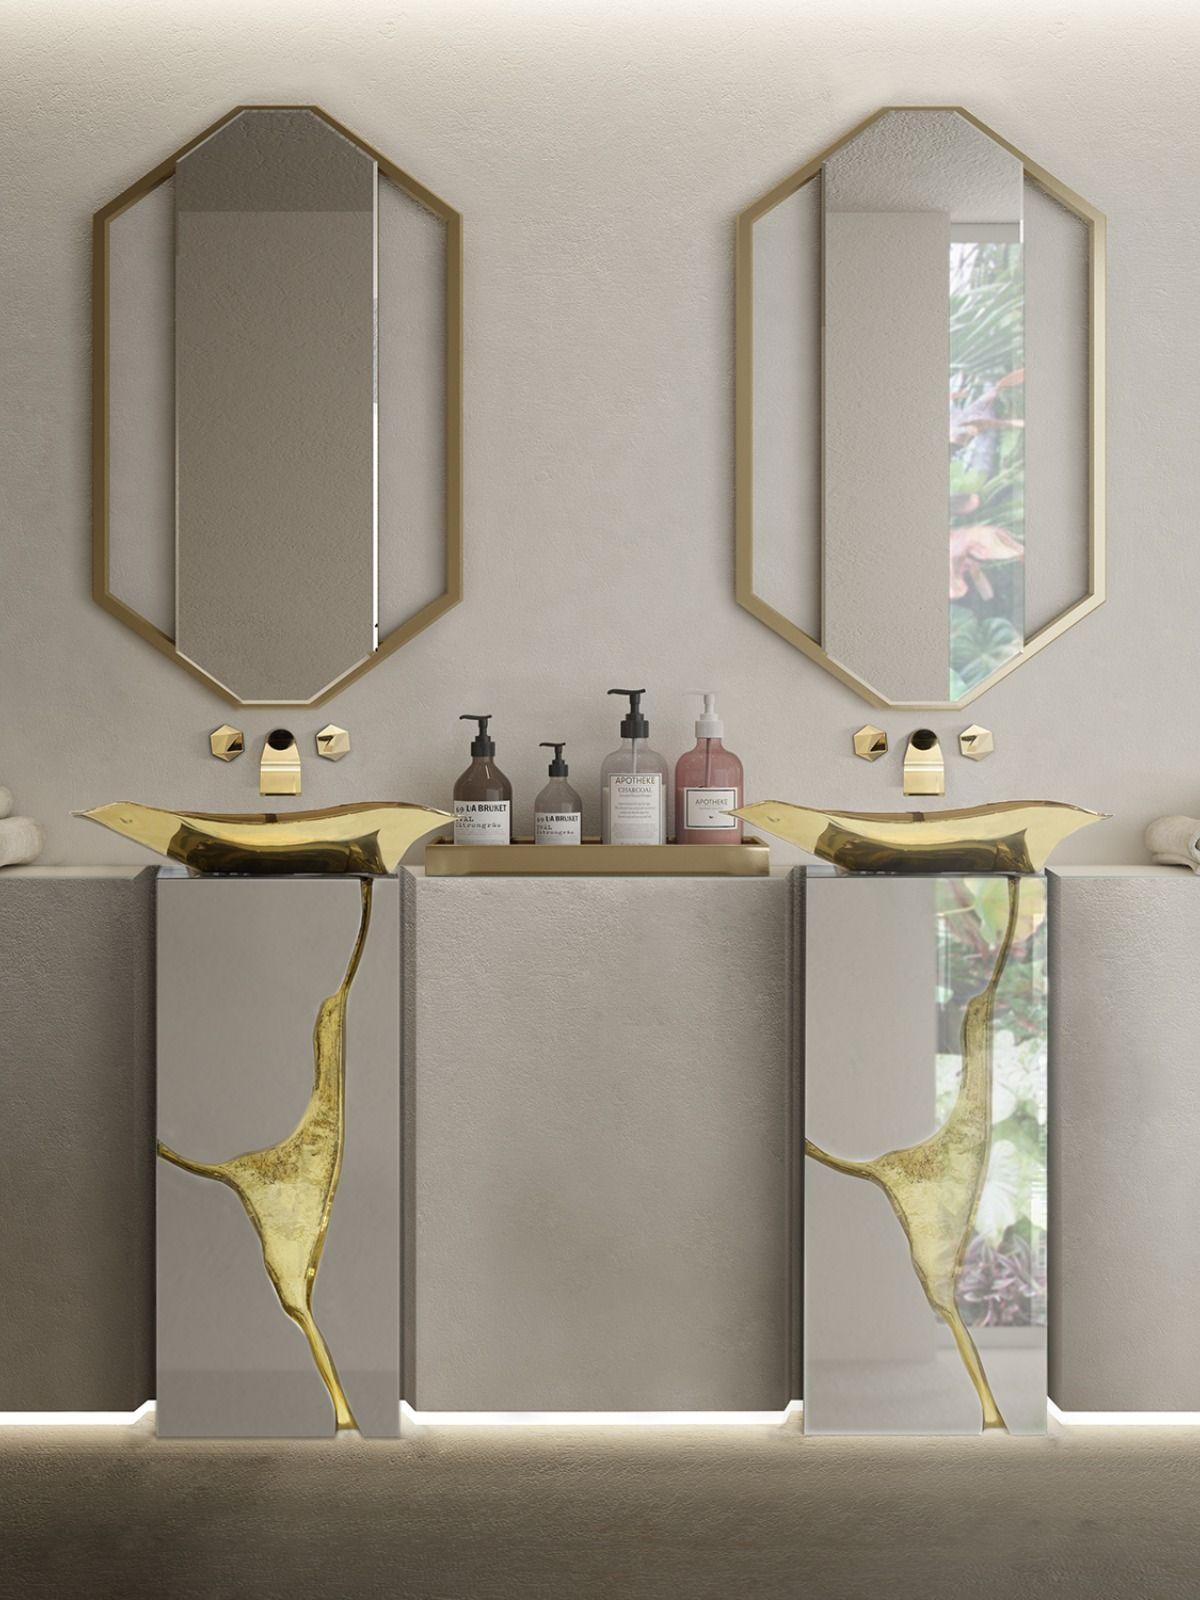 Bathroom Design Ideas - 15 Must-Have Accessories